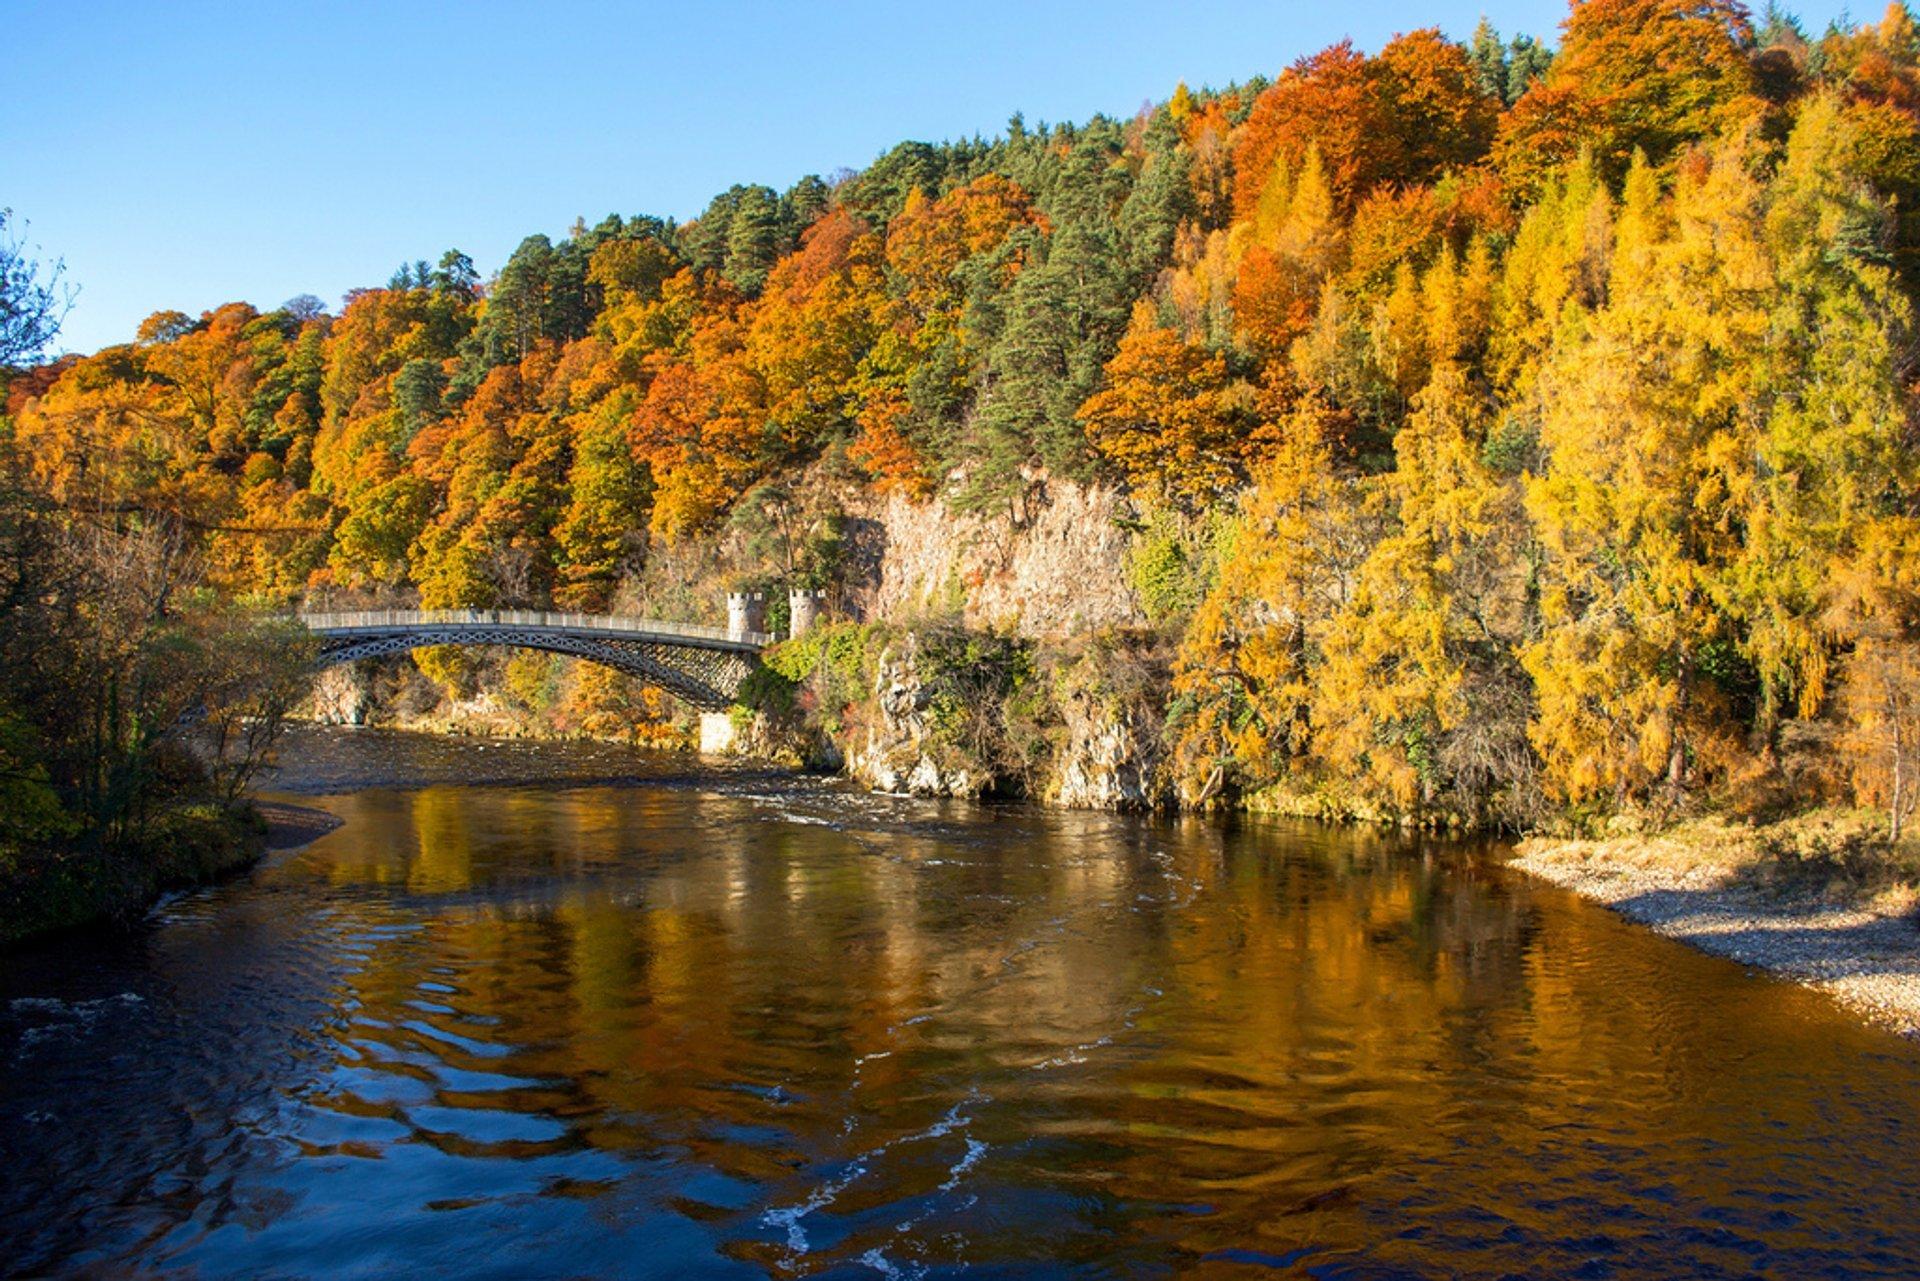 Craigellachie Bridge across the River Spey at Craigellachie, in the vicinity of to Aberlour village in Scotland